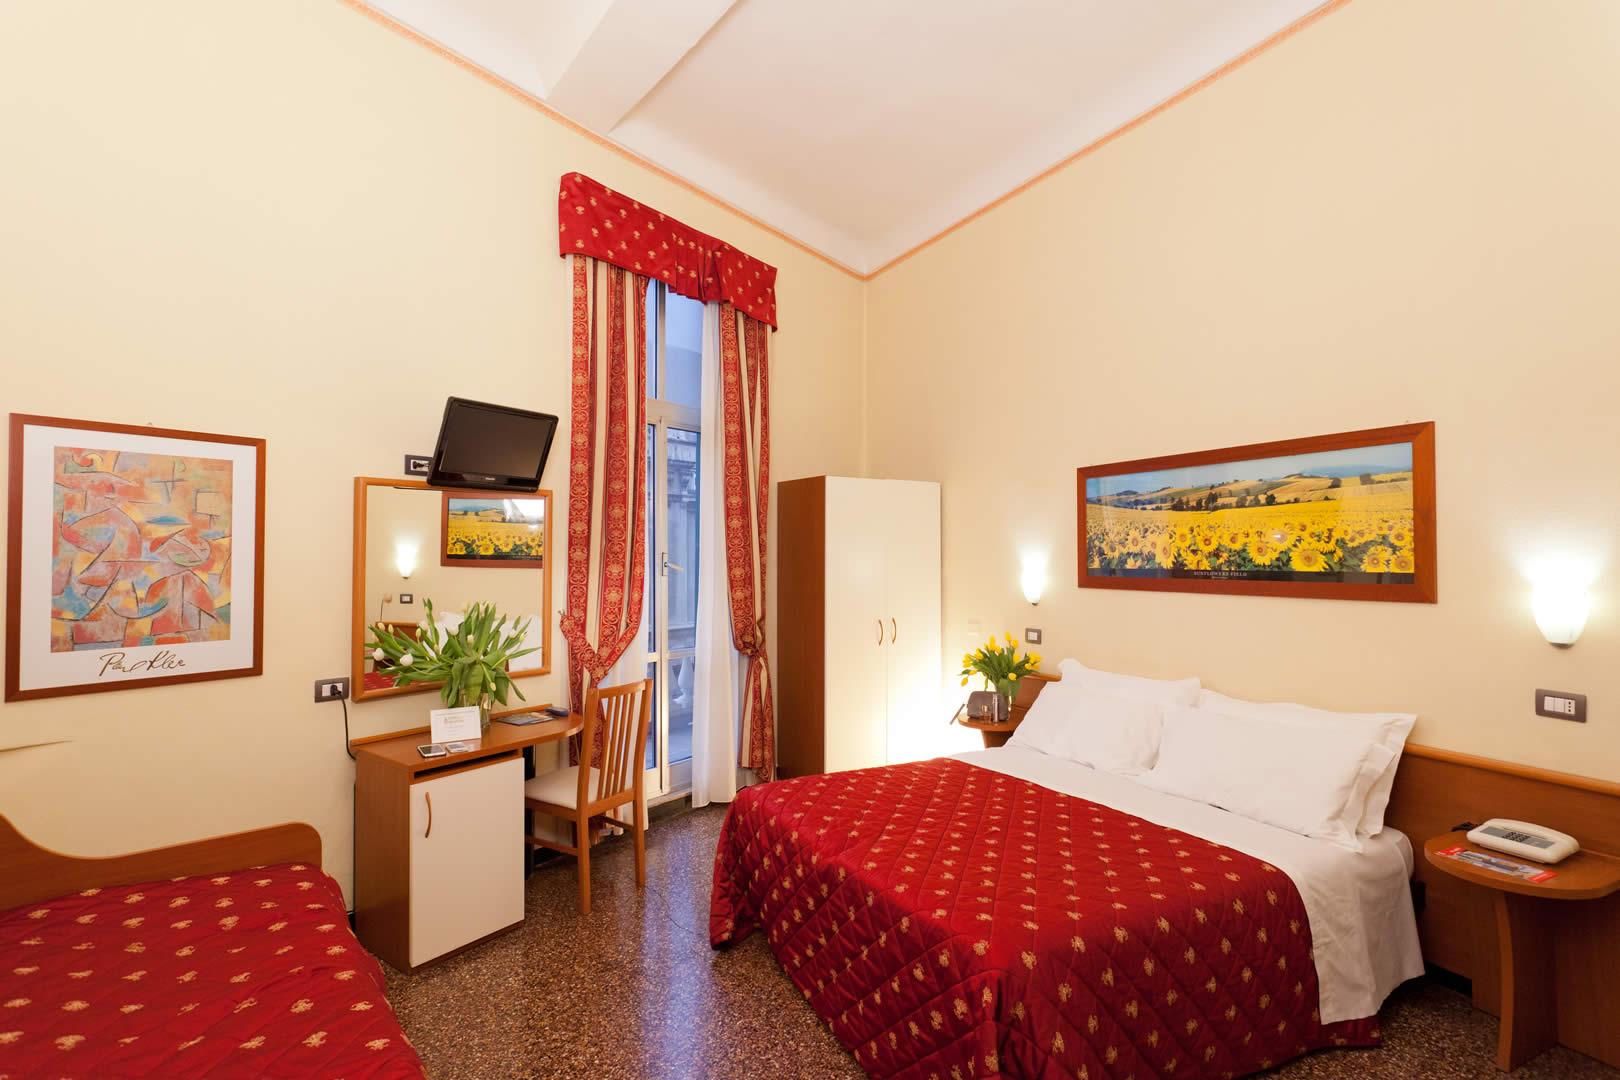 zimmer hotel genua klimaanlage wi fi parkplatz ligurien. Black Bedroom Furniture Sets. Home Design Ideas